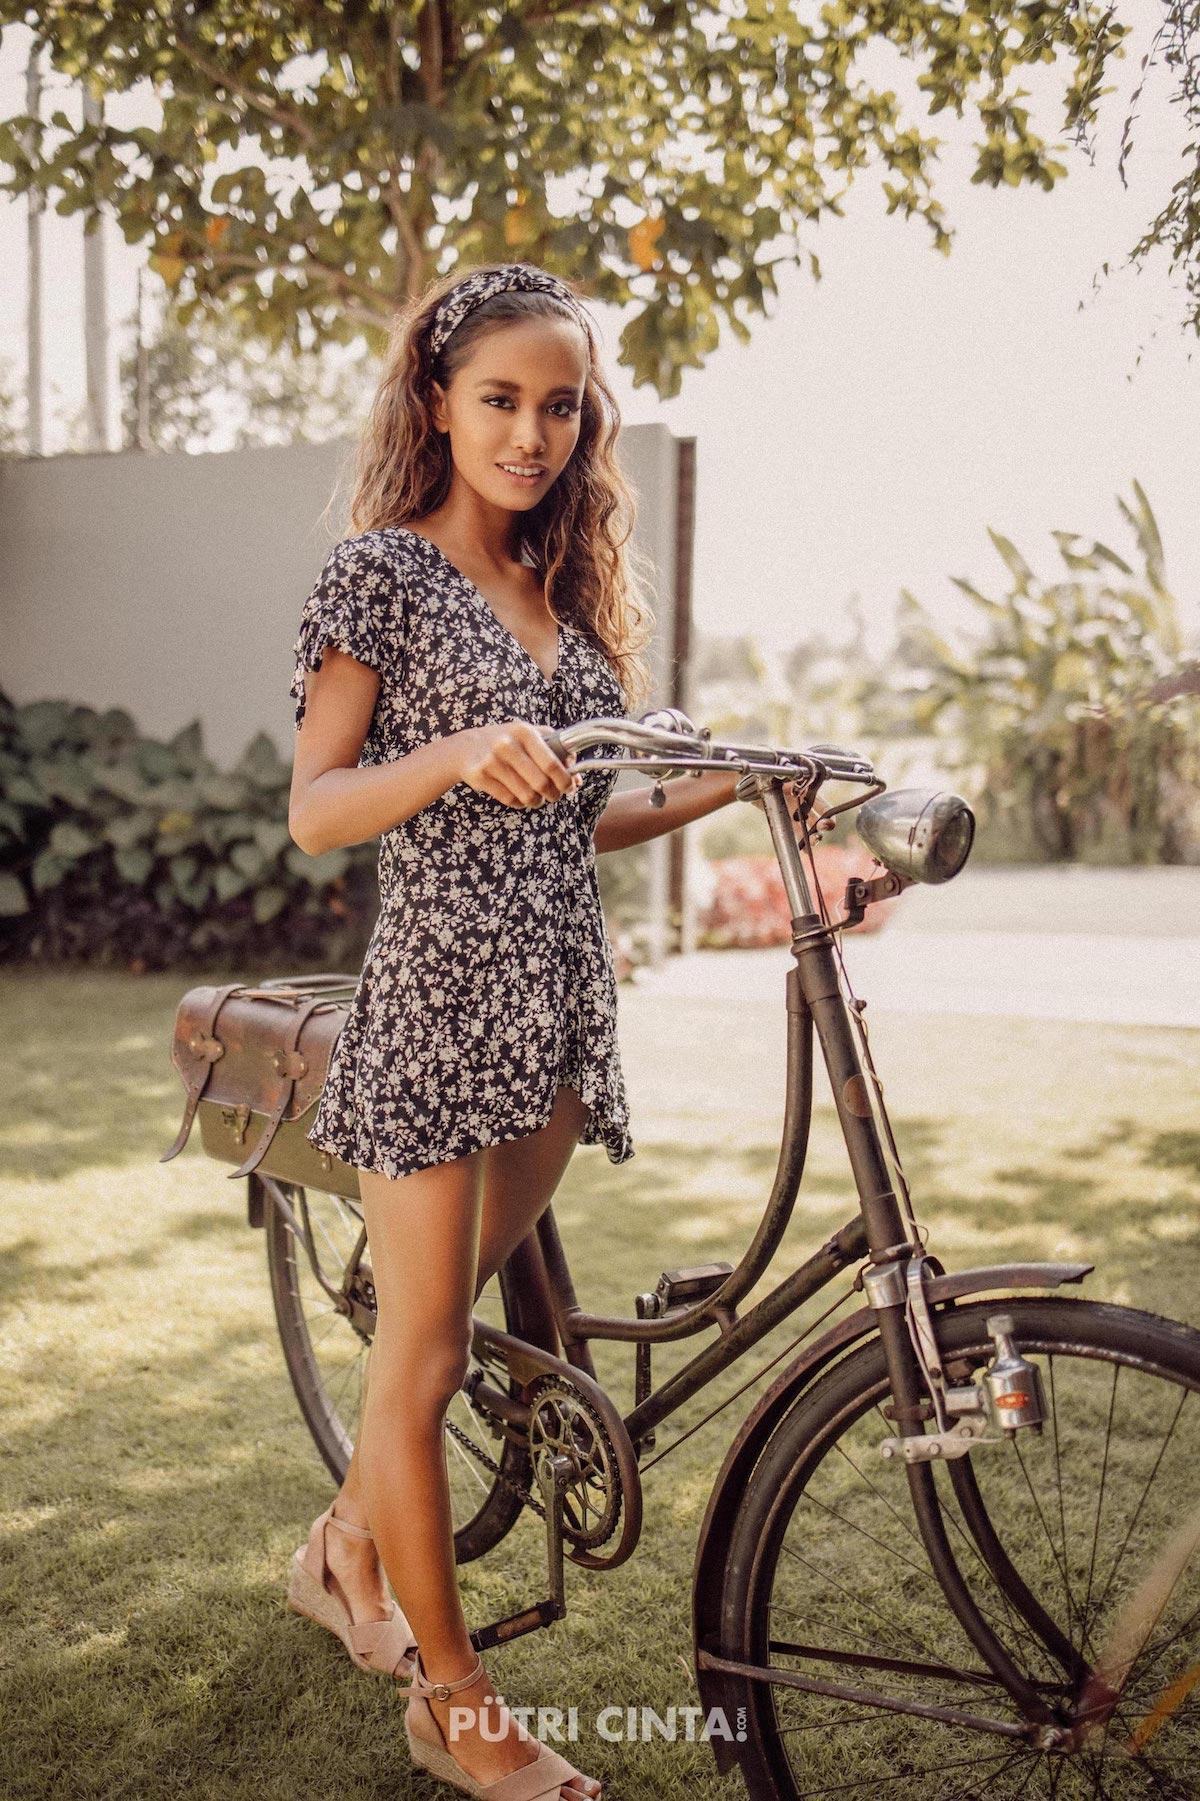 024-Putri-Cinta-Cycling-Commando-photoset-15.jpg